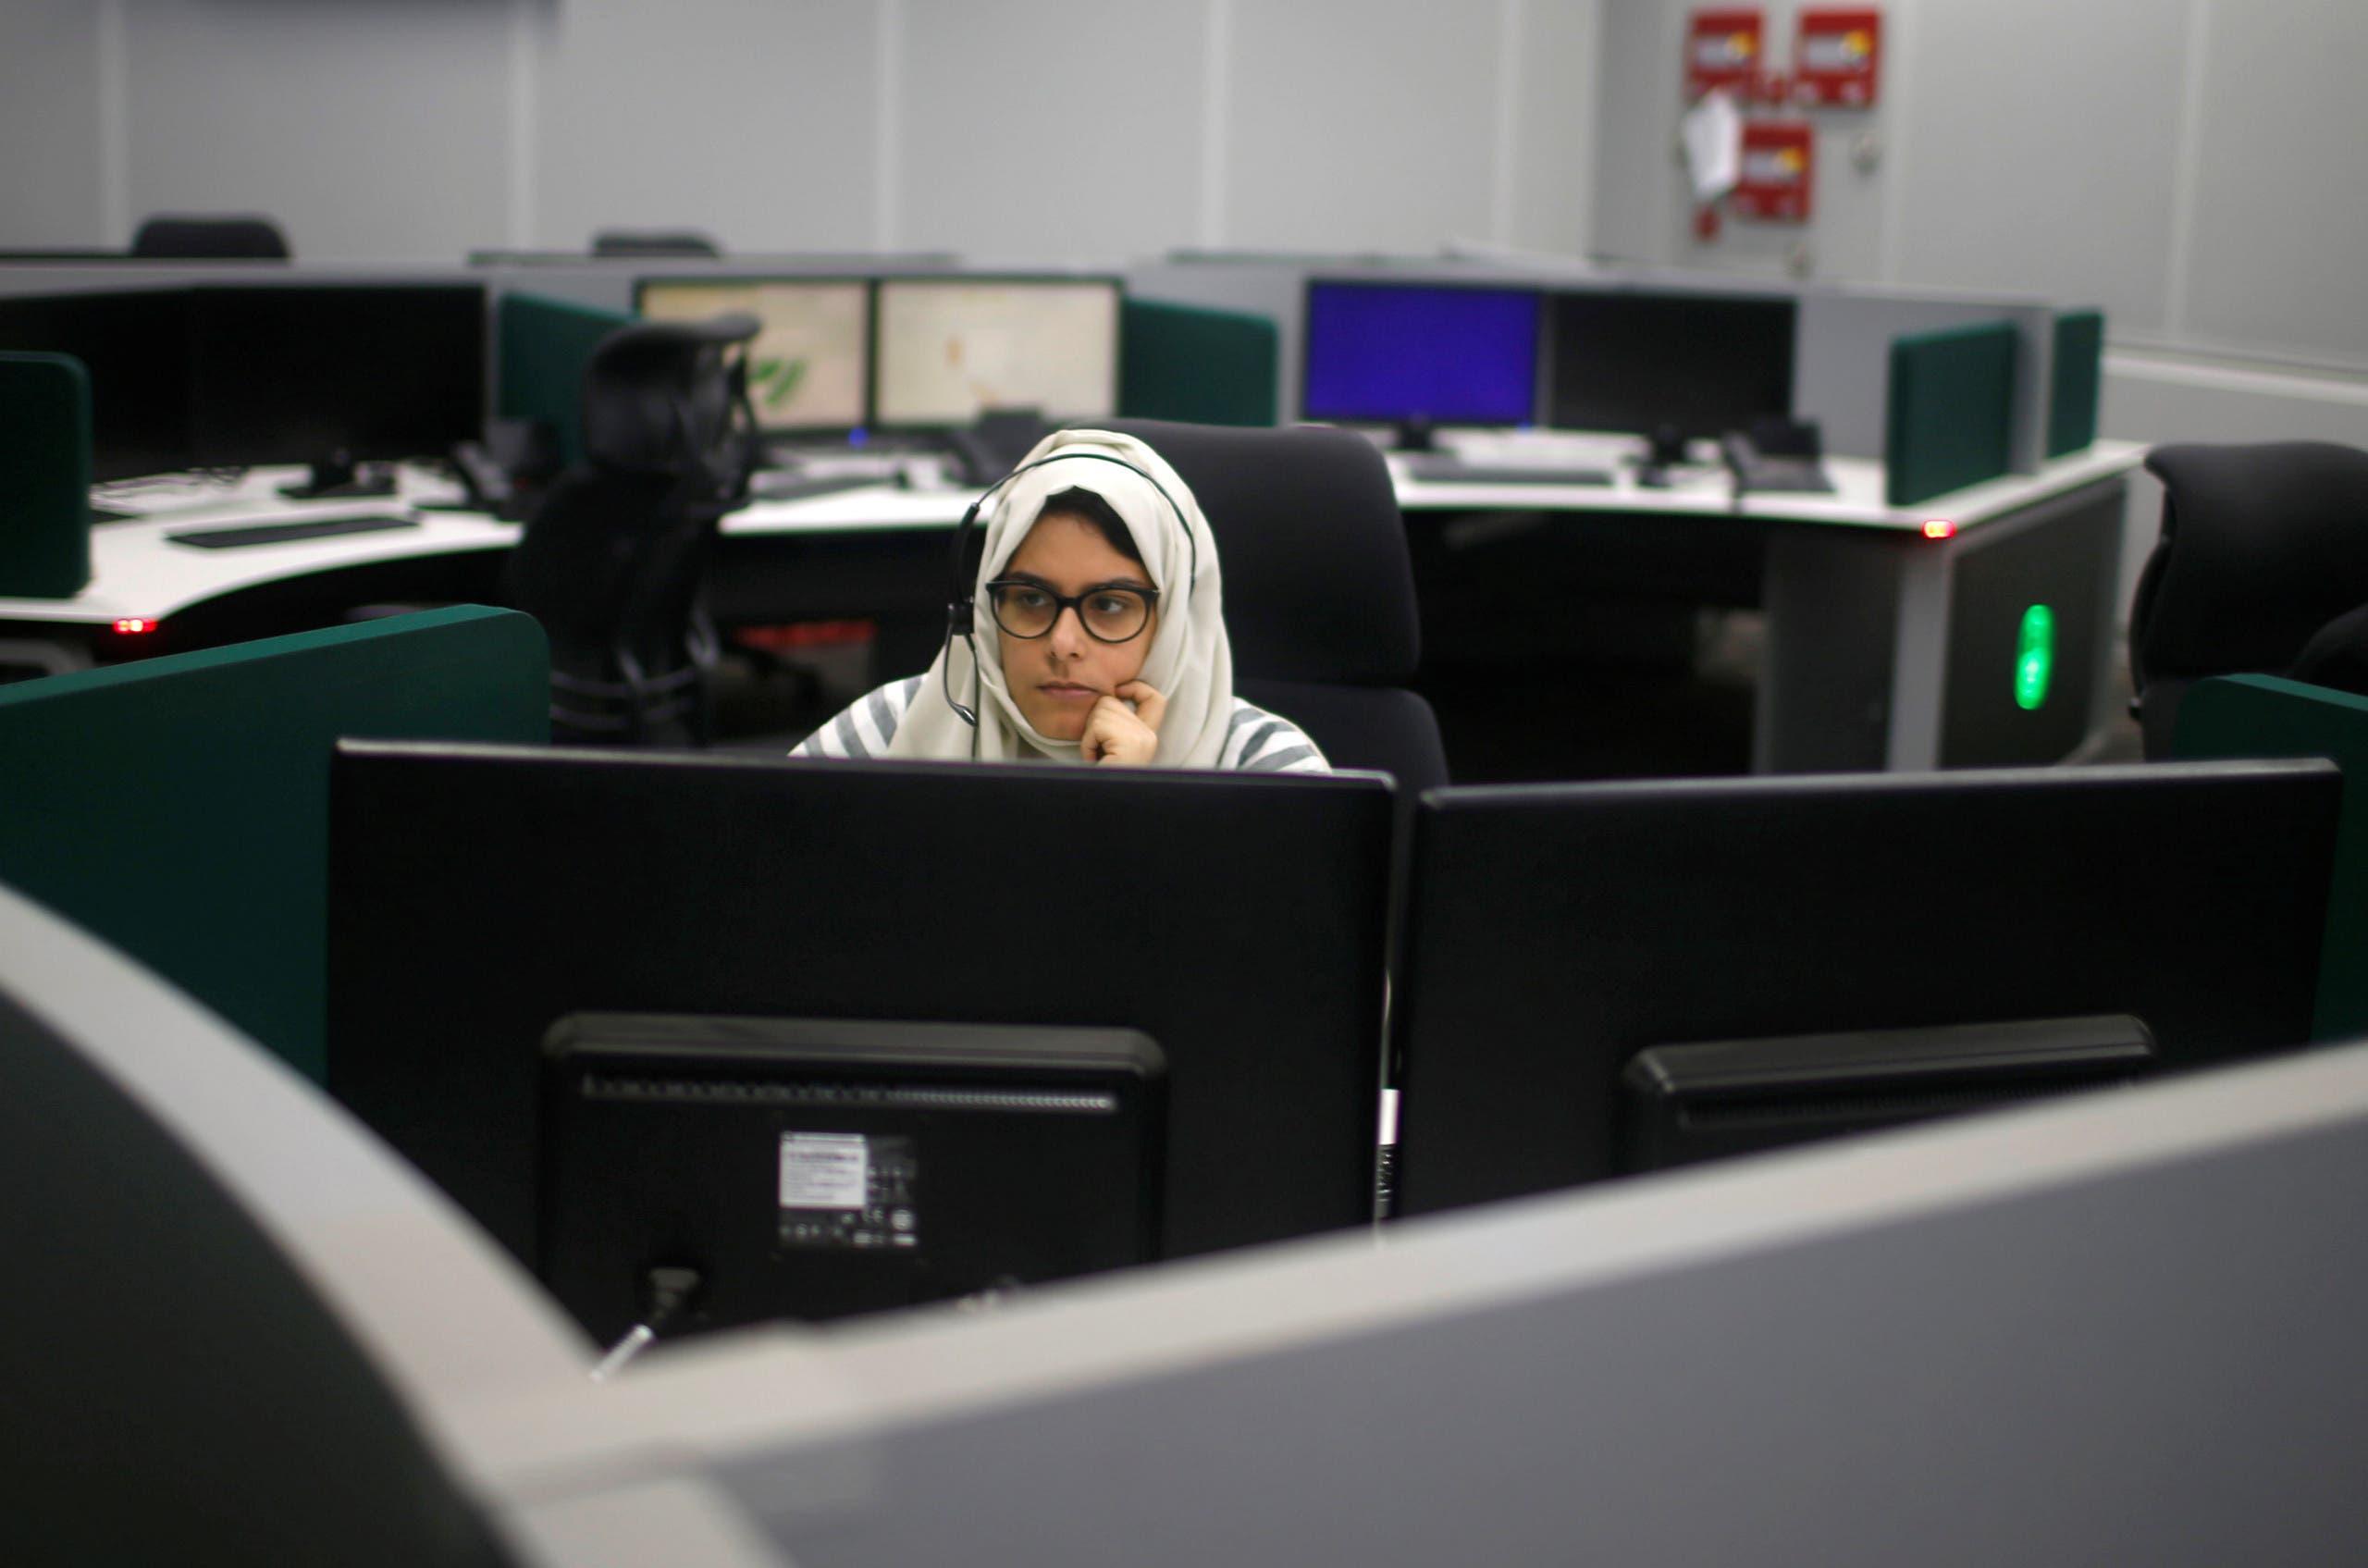 A Saudi Arabian woman works inside a call center in Mecca. (File photo: Reuters)